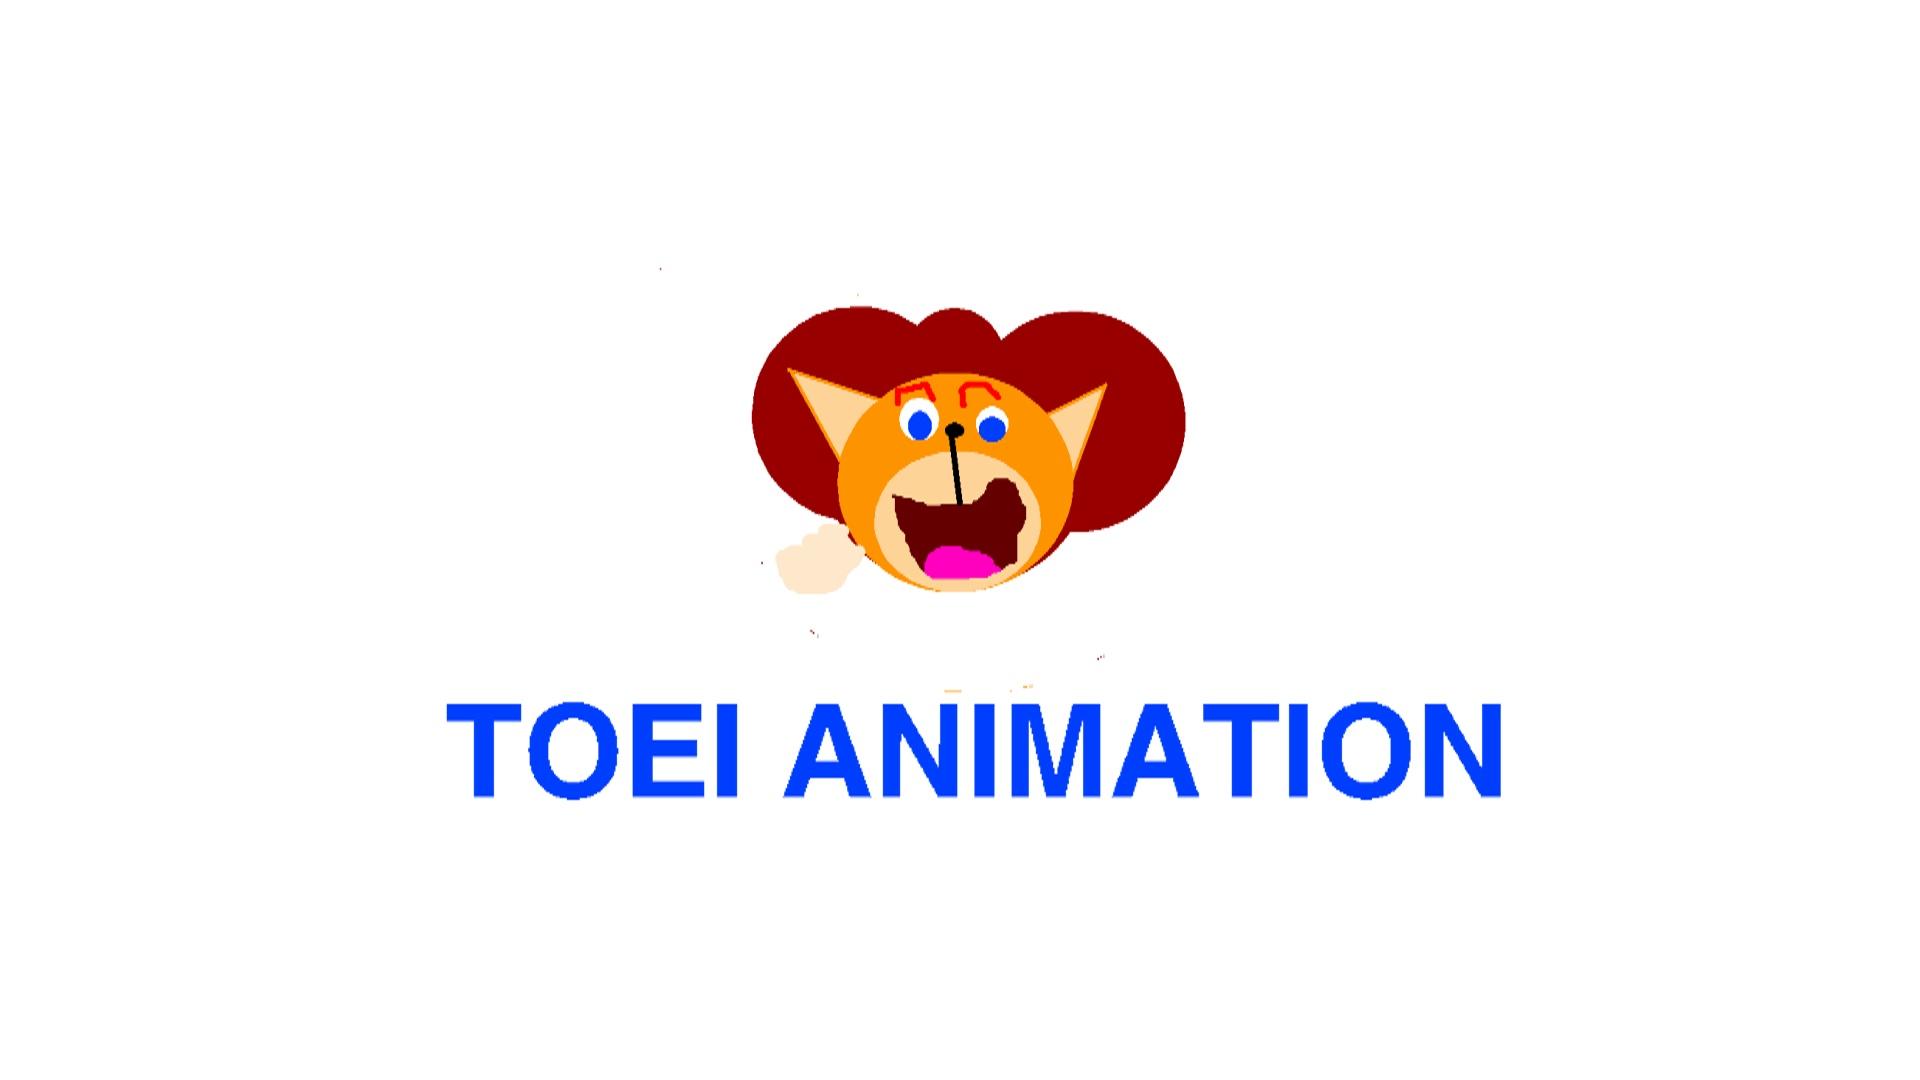 Image toei animation logo jpg scary logos wiki